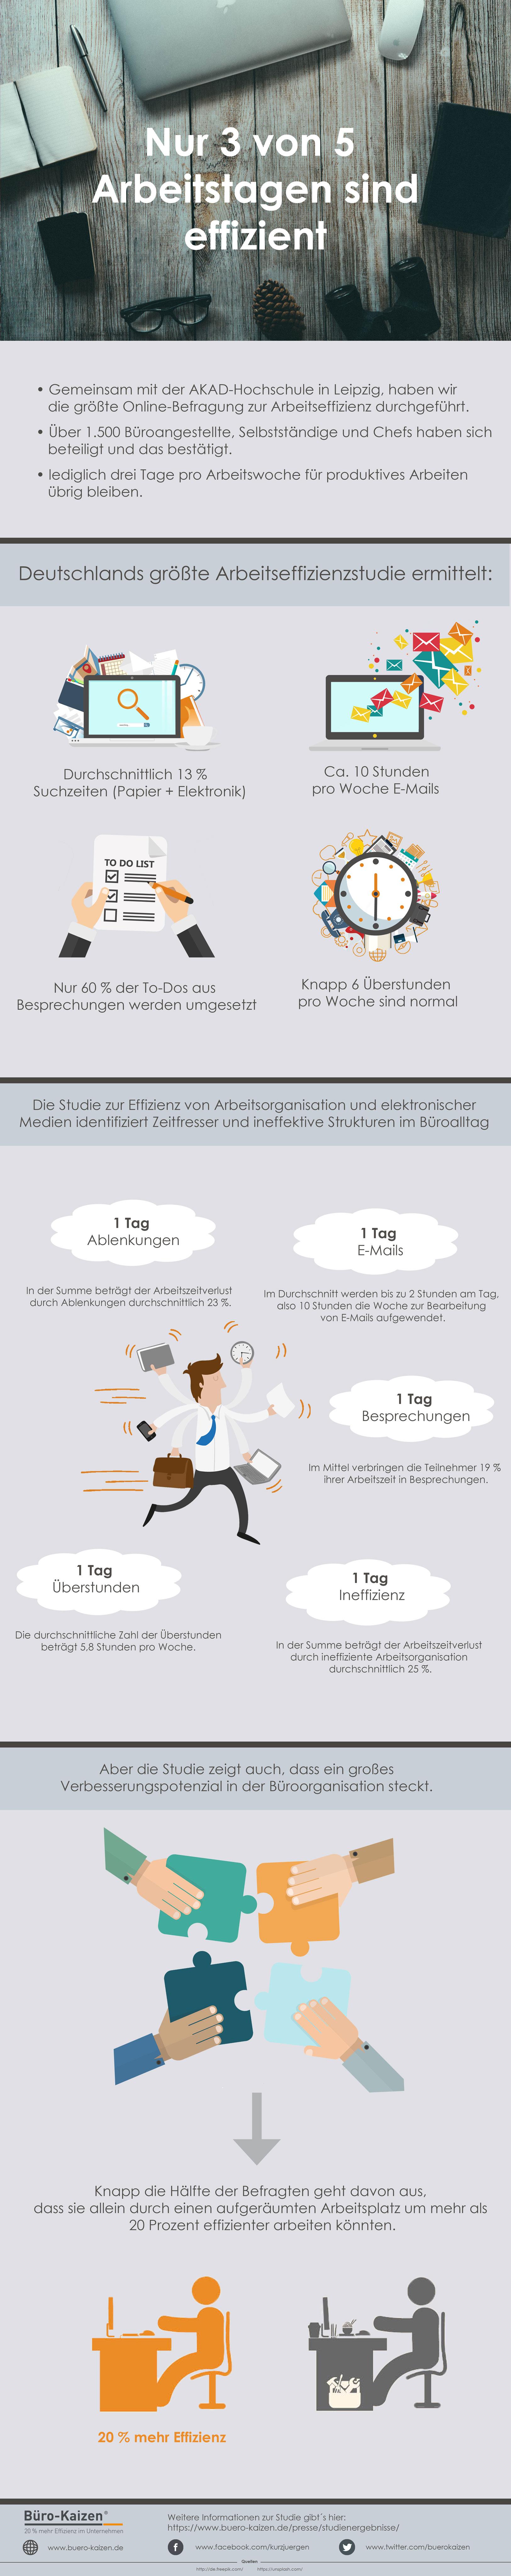 infografik-adad-studie-webformat